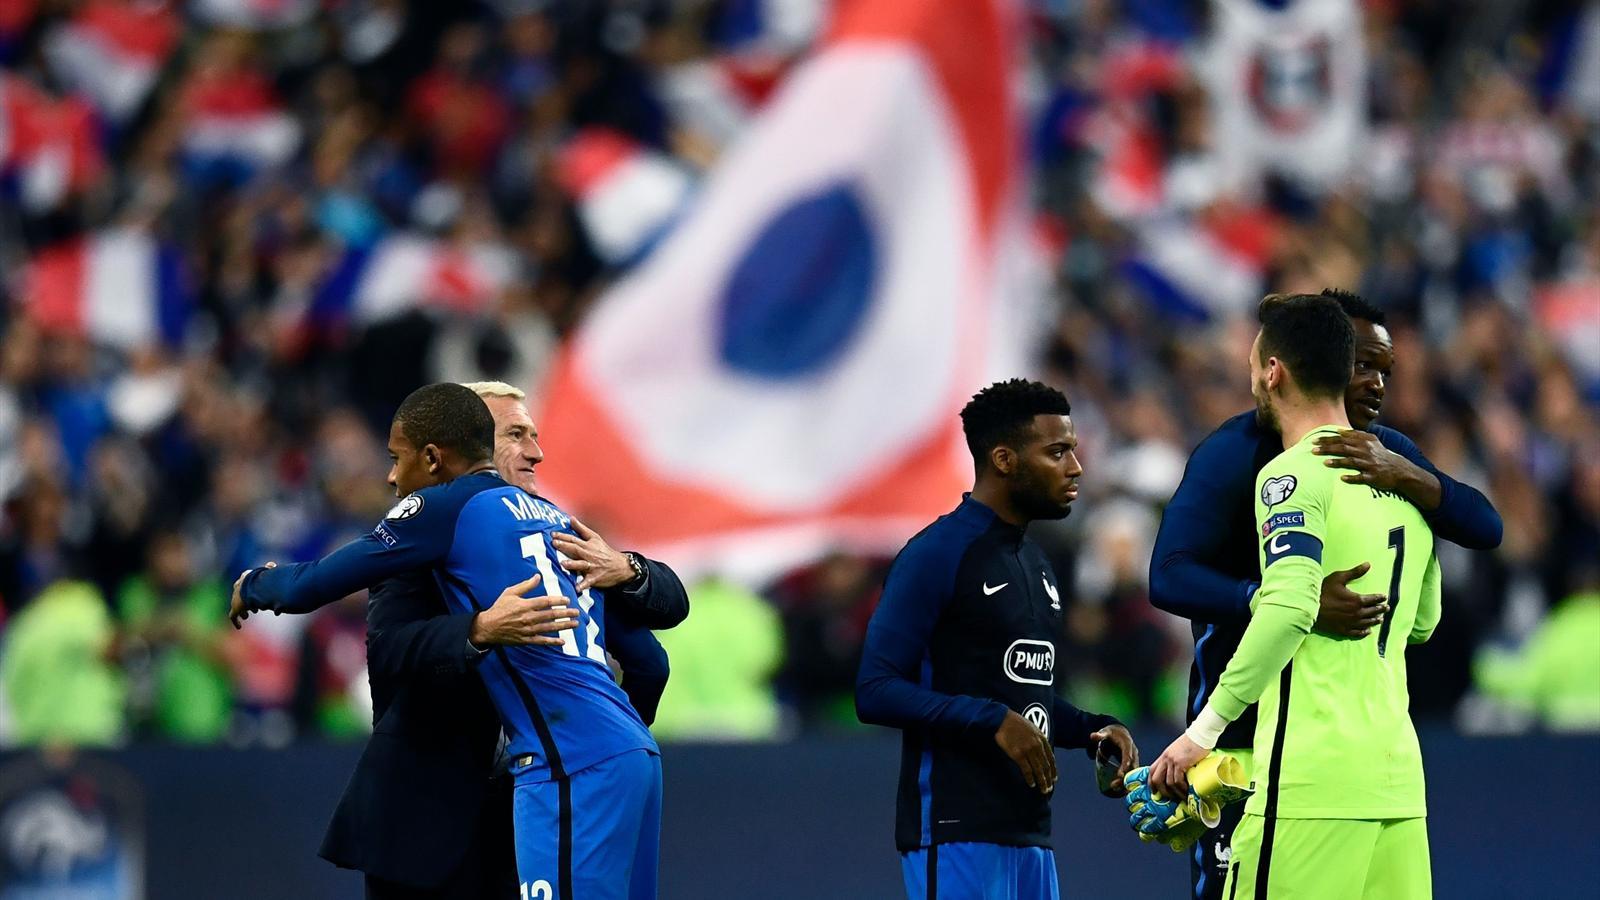 Equipe de france ayez confiance en deschamps coupe du monde 2018 football eurosport - Coupe de france football calendrier ...